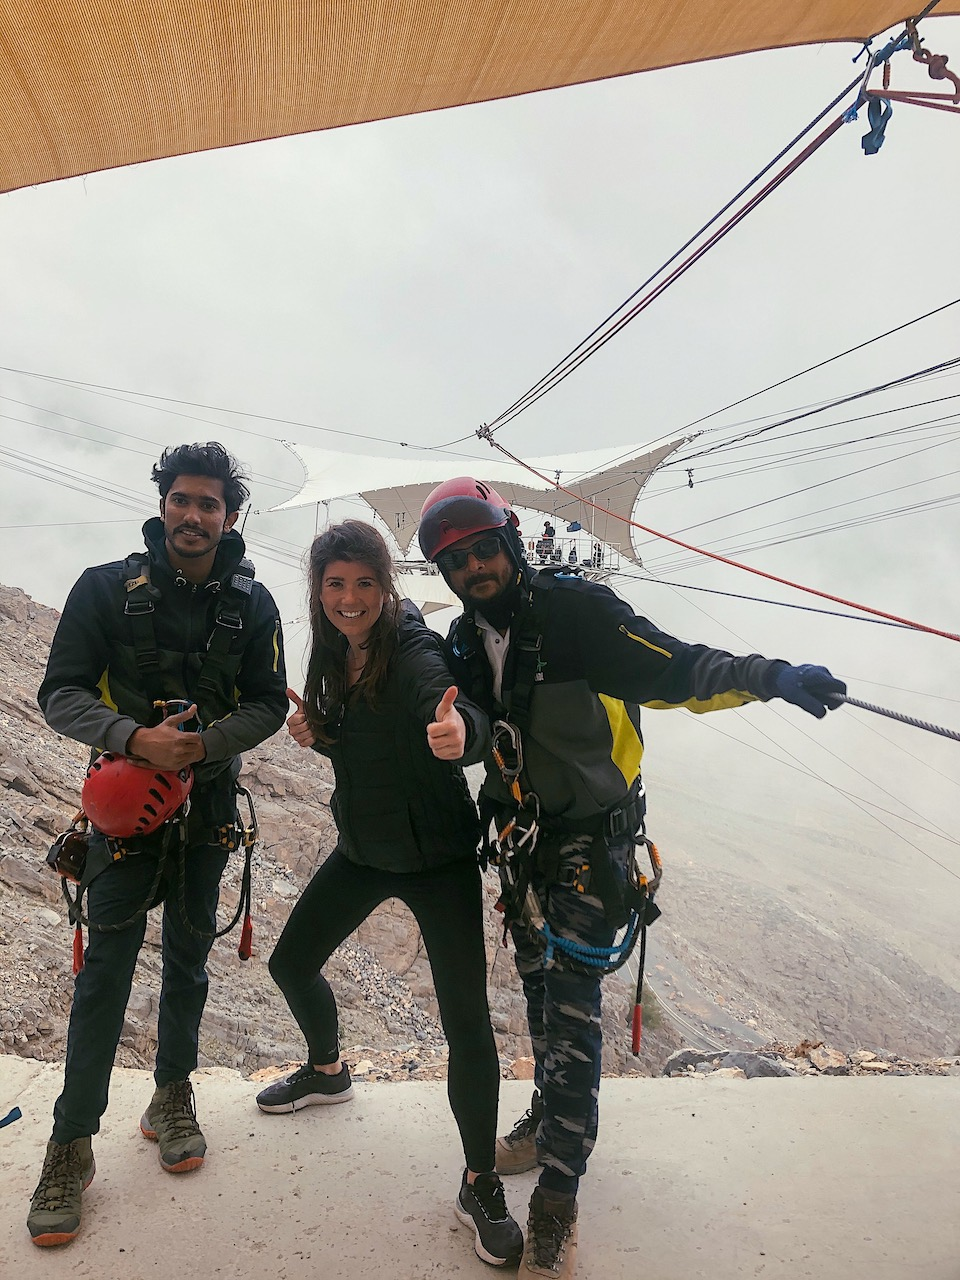 hiking trails jebel jais - Jebel Jais Flight: de langste zipline ter wereld in Ras Al Khaimah. Toroverde  Chloe Sterk